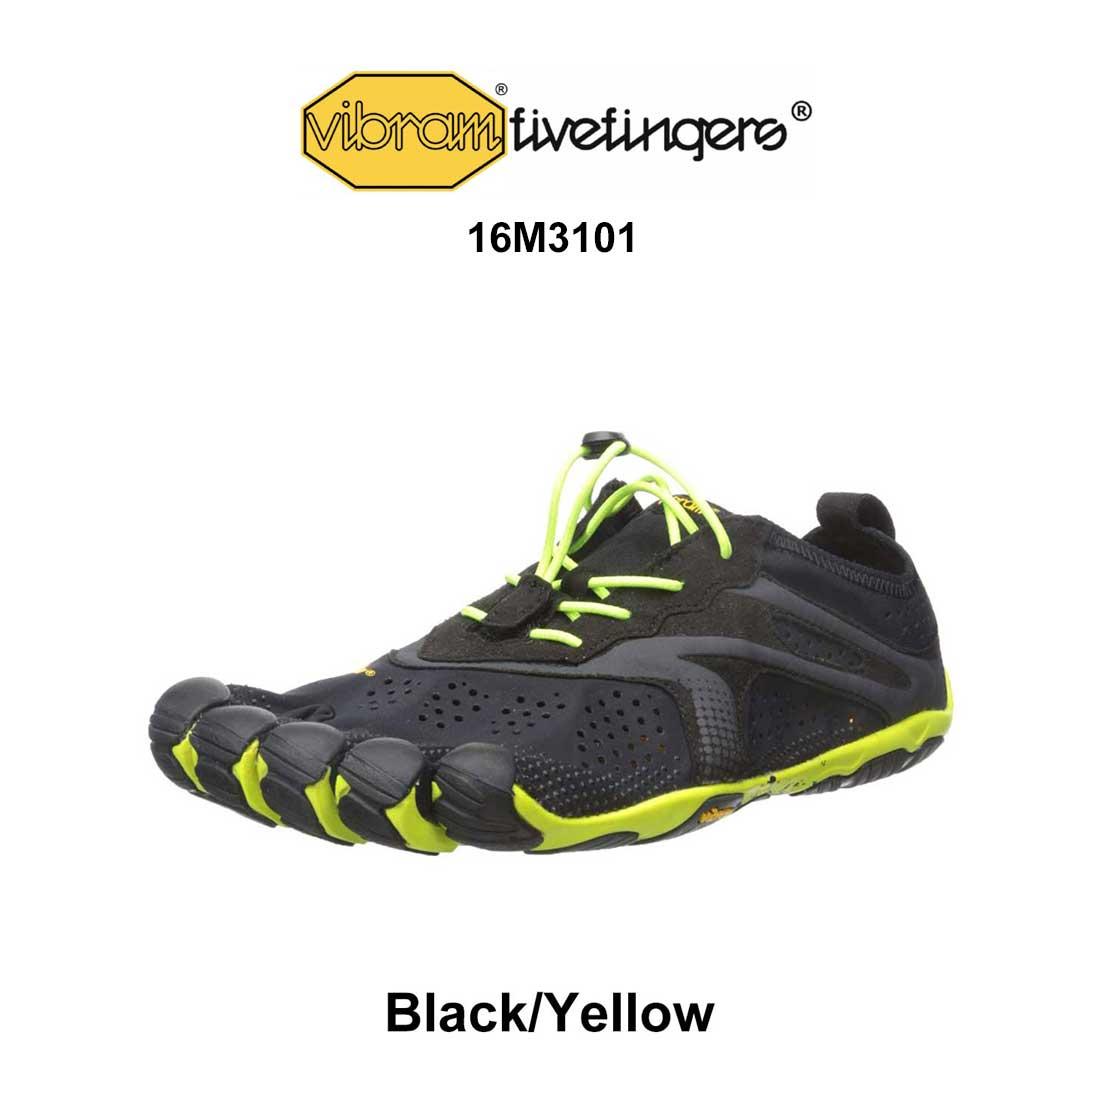 Vibram FiveFingers(ビブラムファイブフィンガーズ)V-RUN メンズ 五本指 シューズ 16M3101